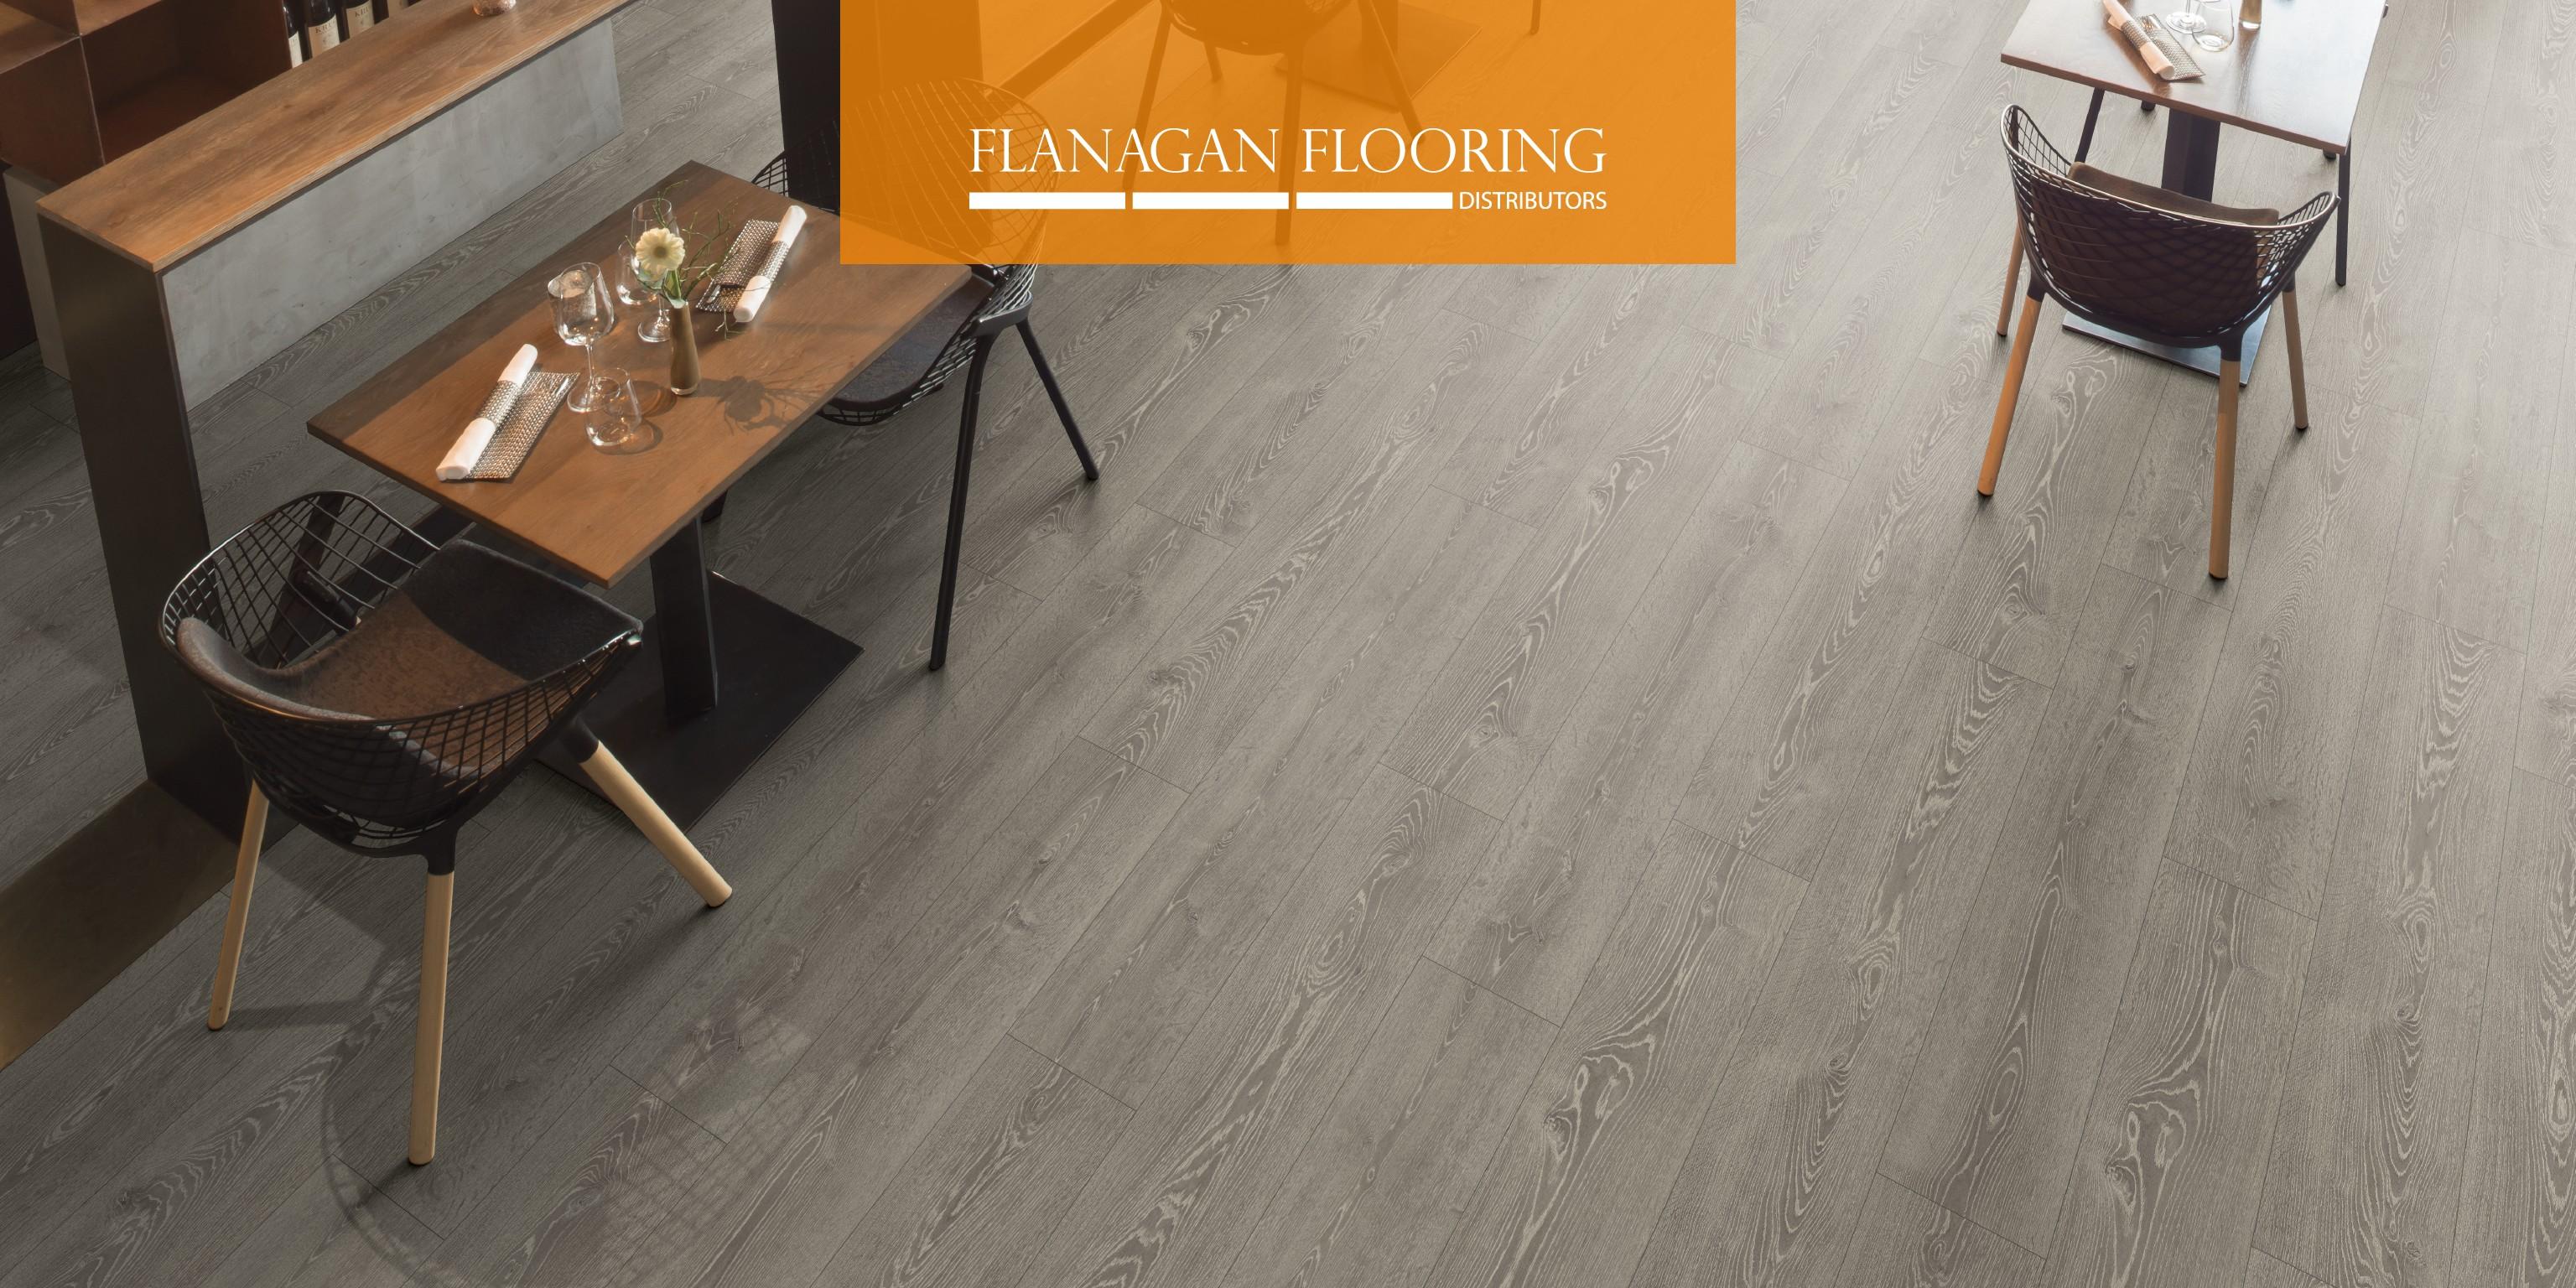 Flanagan Flooring Distributors Linkedin